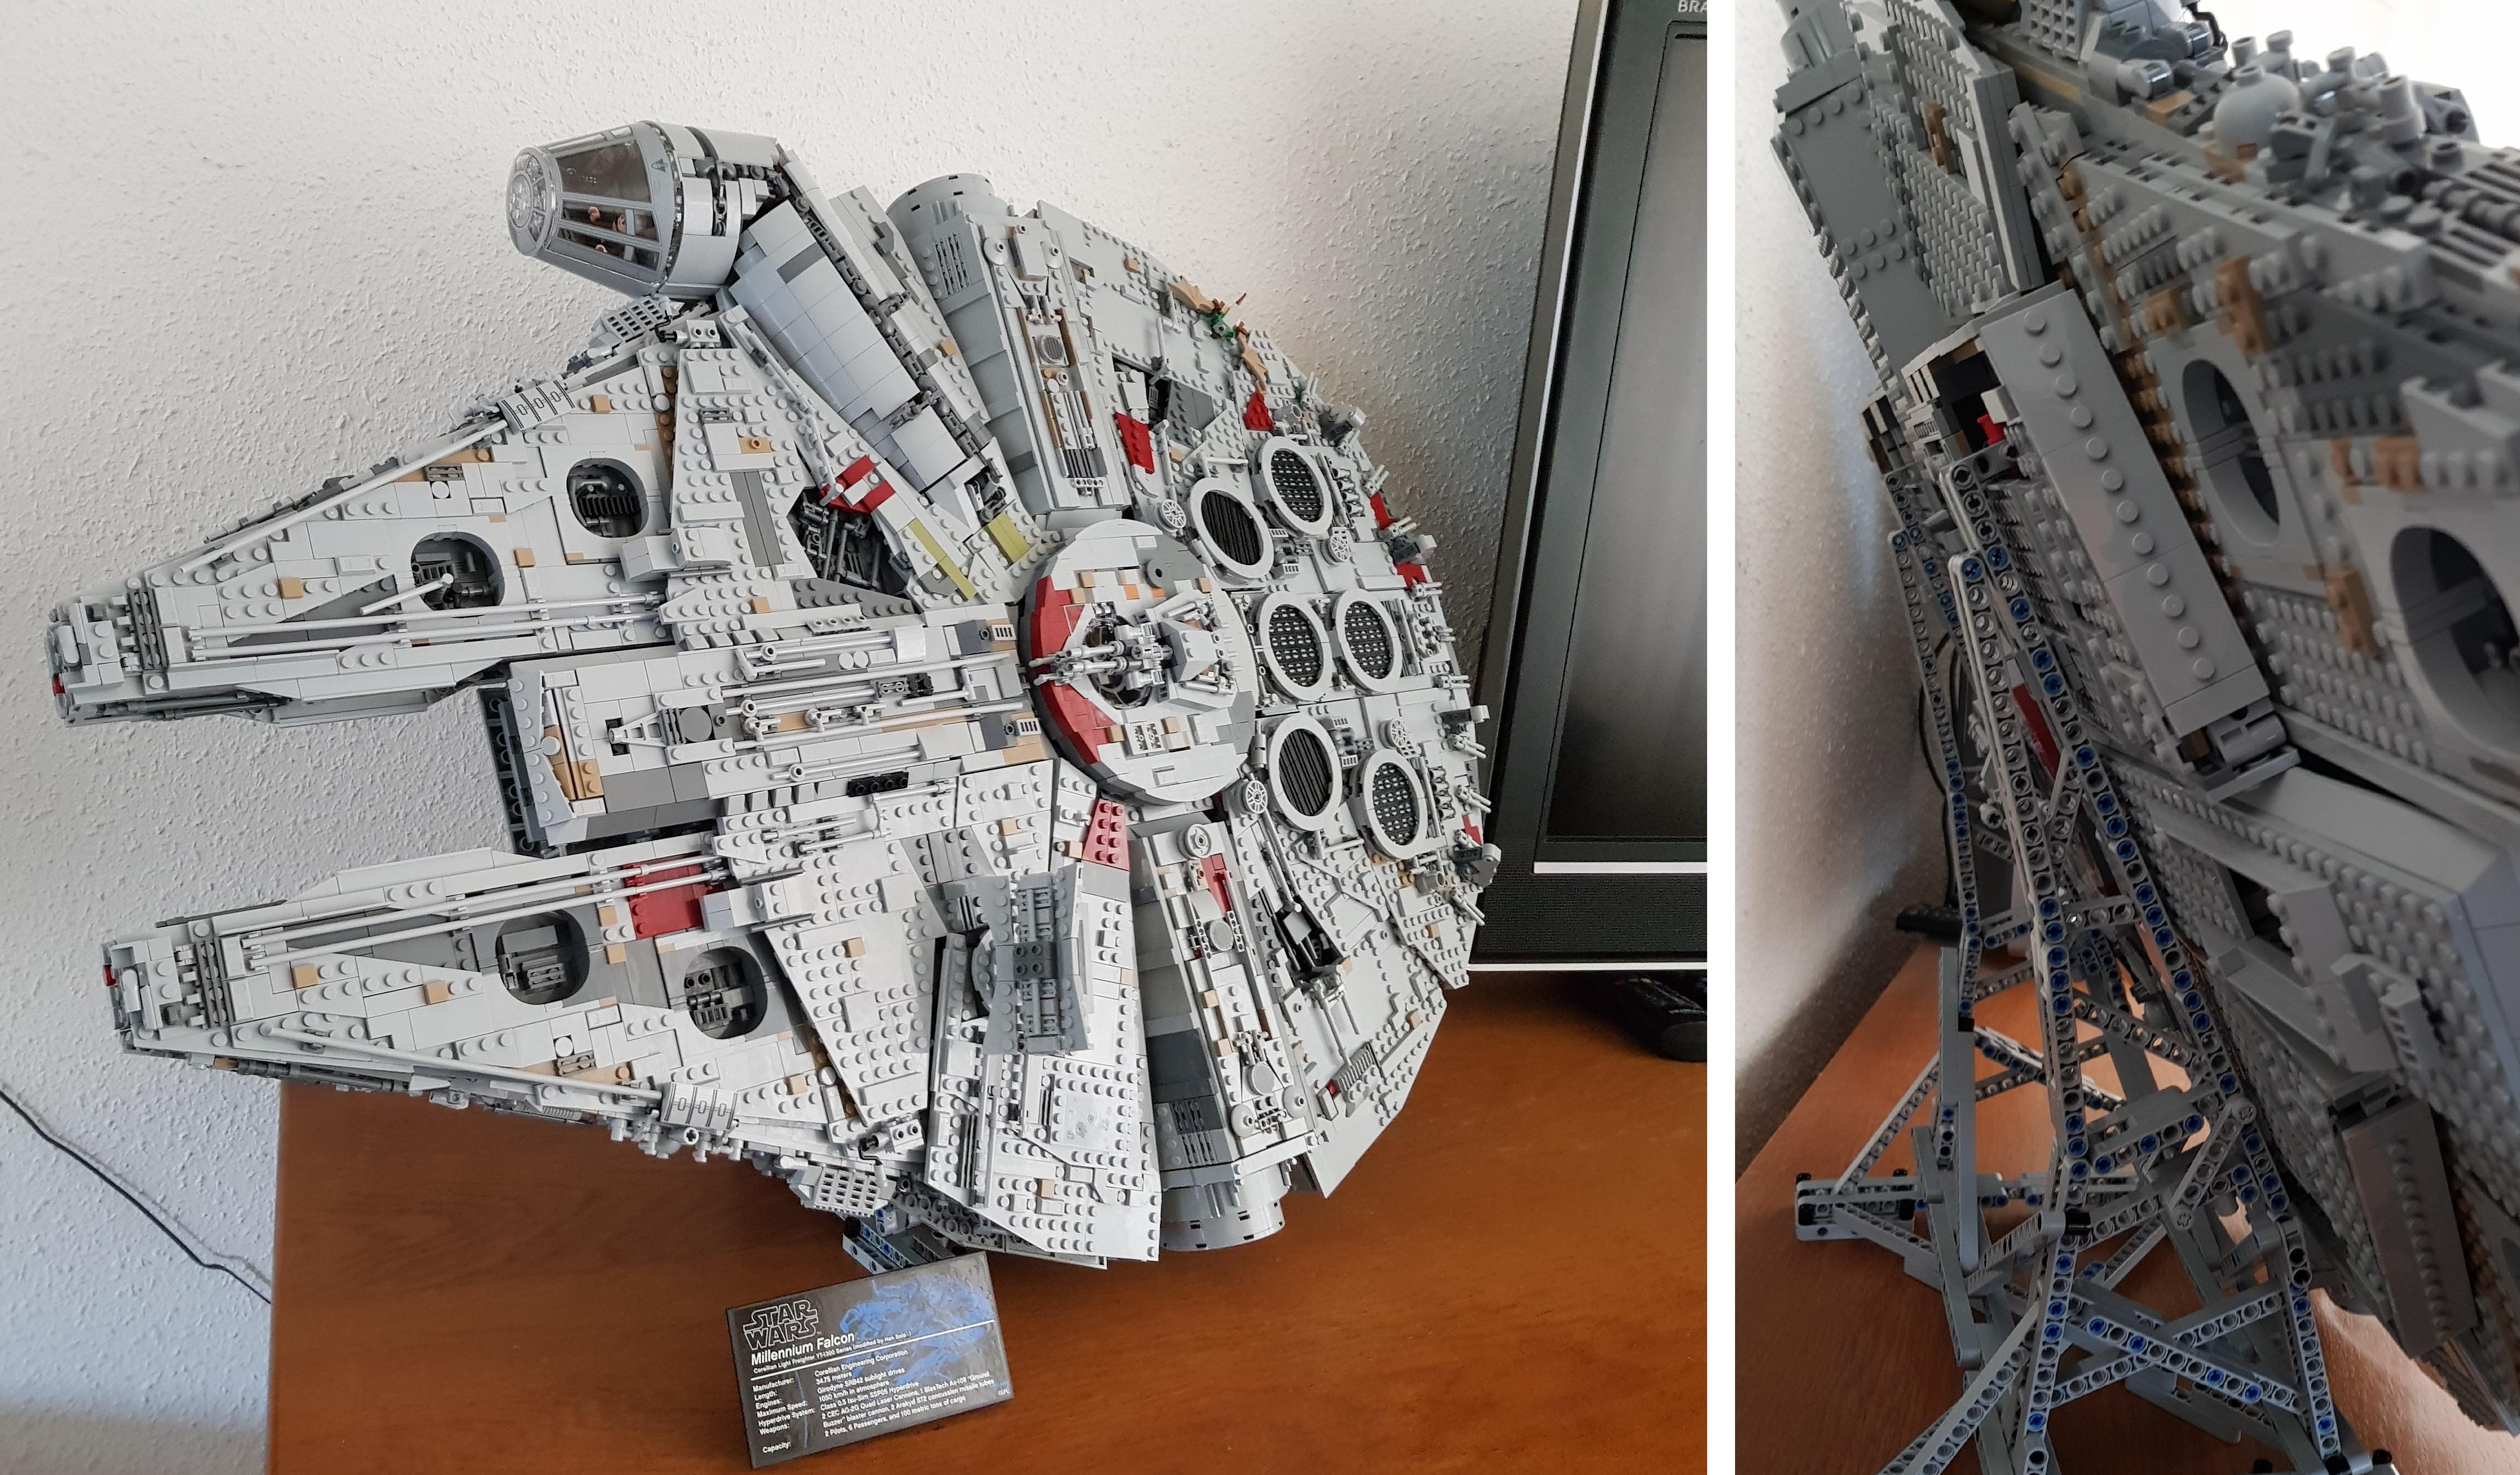 Ucs Millennium Falcon On Angled Stand Lego Lego Star Wars Millennium Falcon